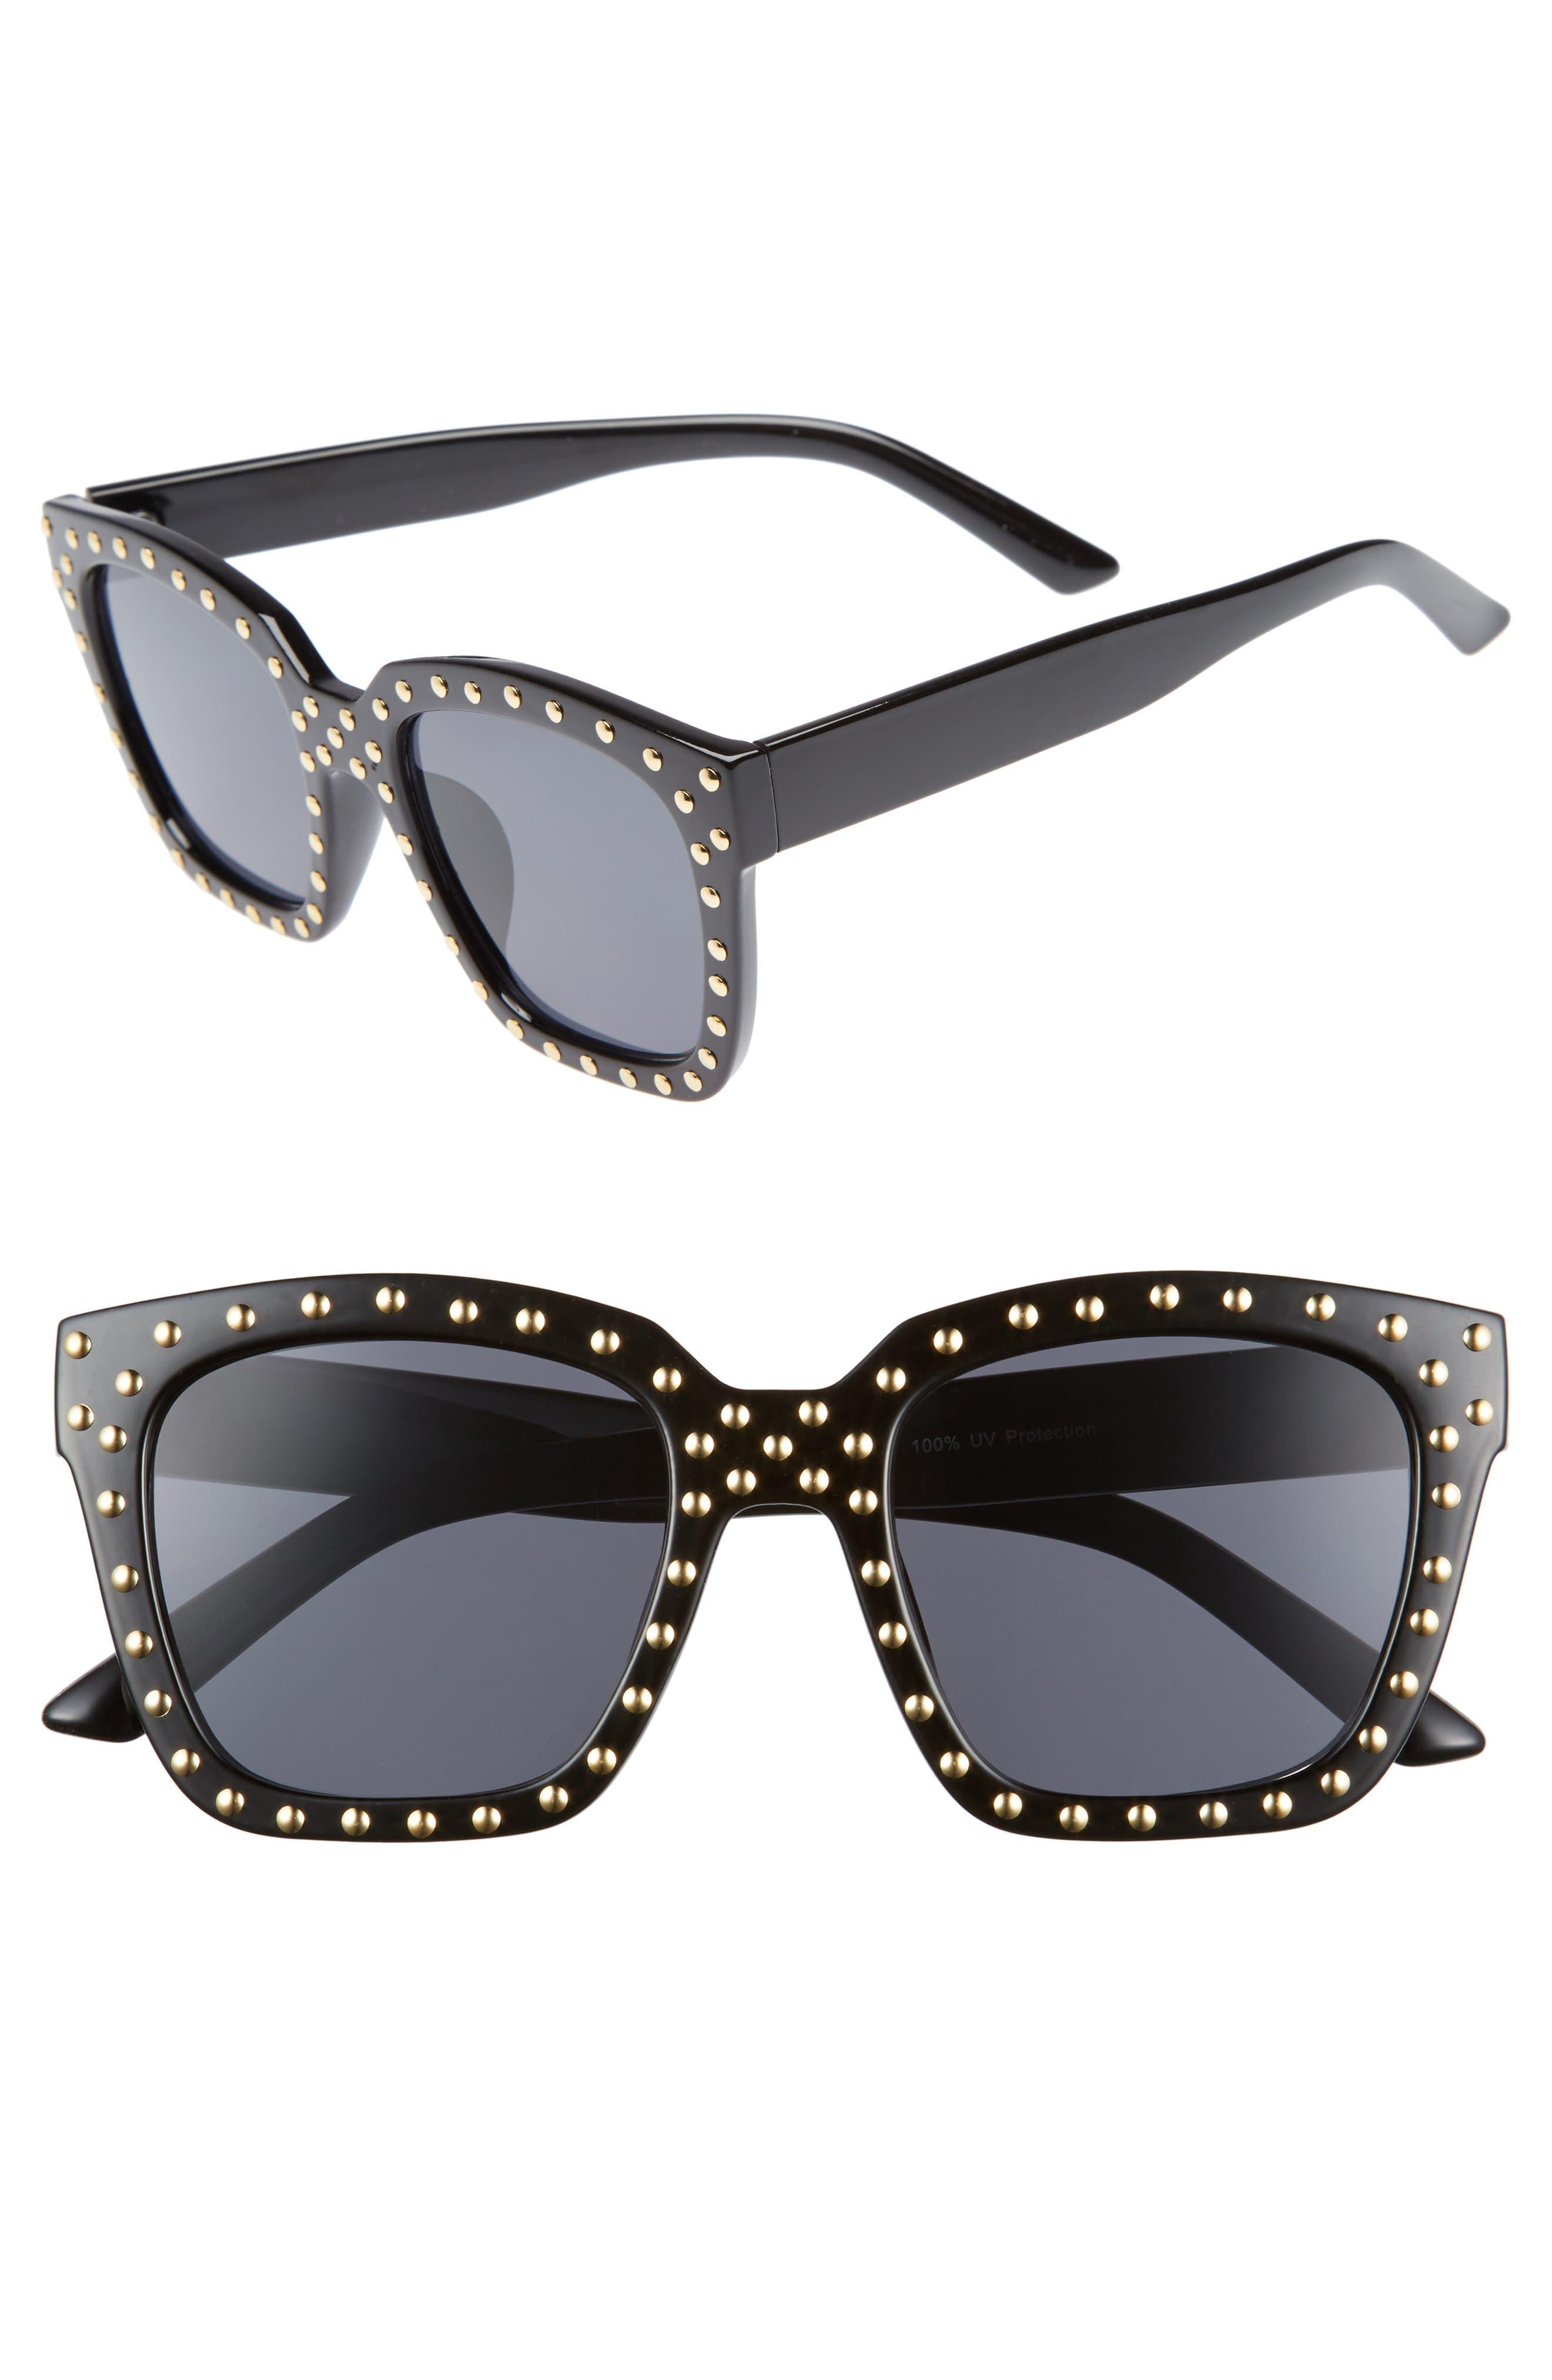 Studded Square Sunglasses,                             Main thumbnail 1, color,                             001